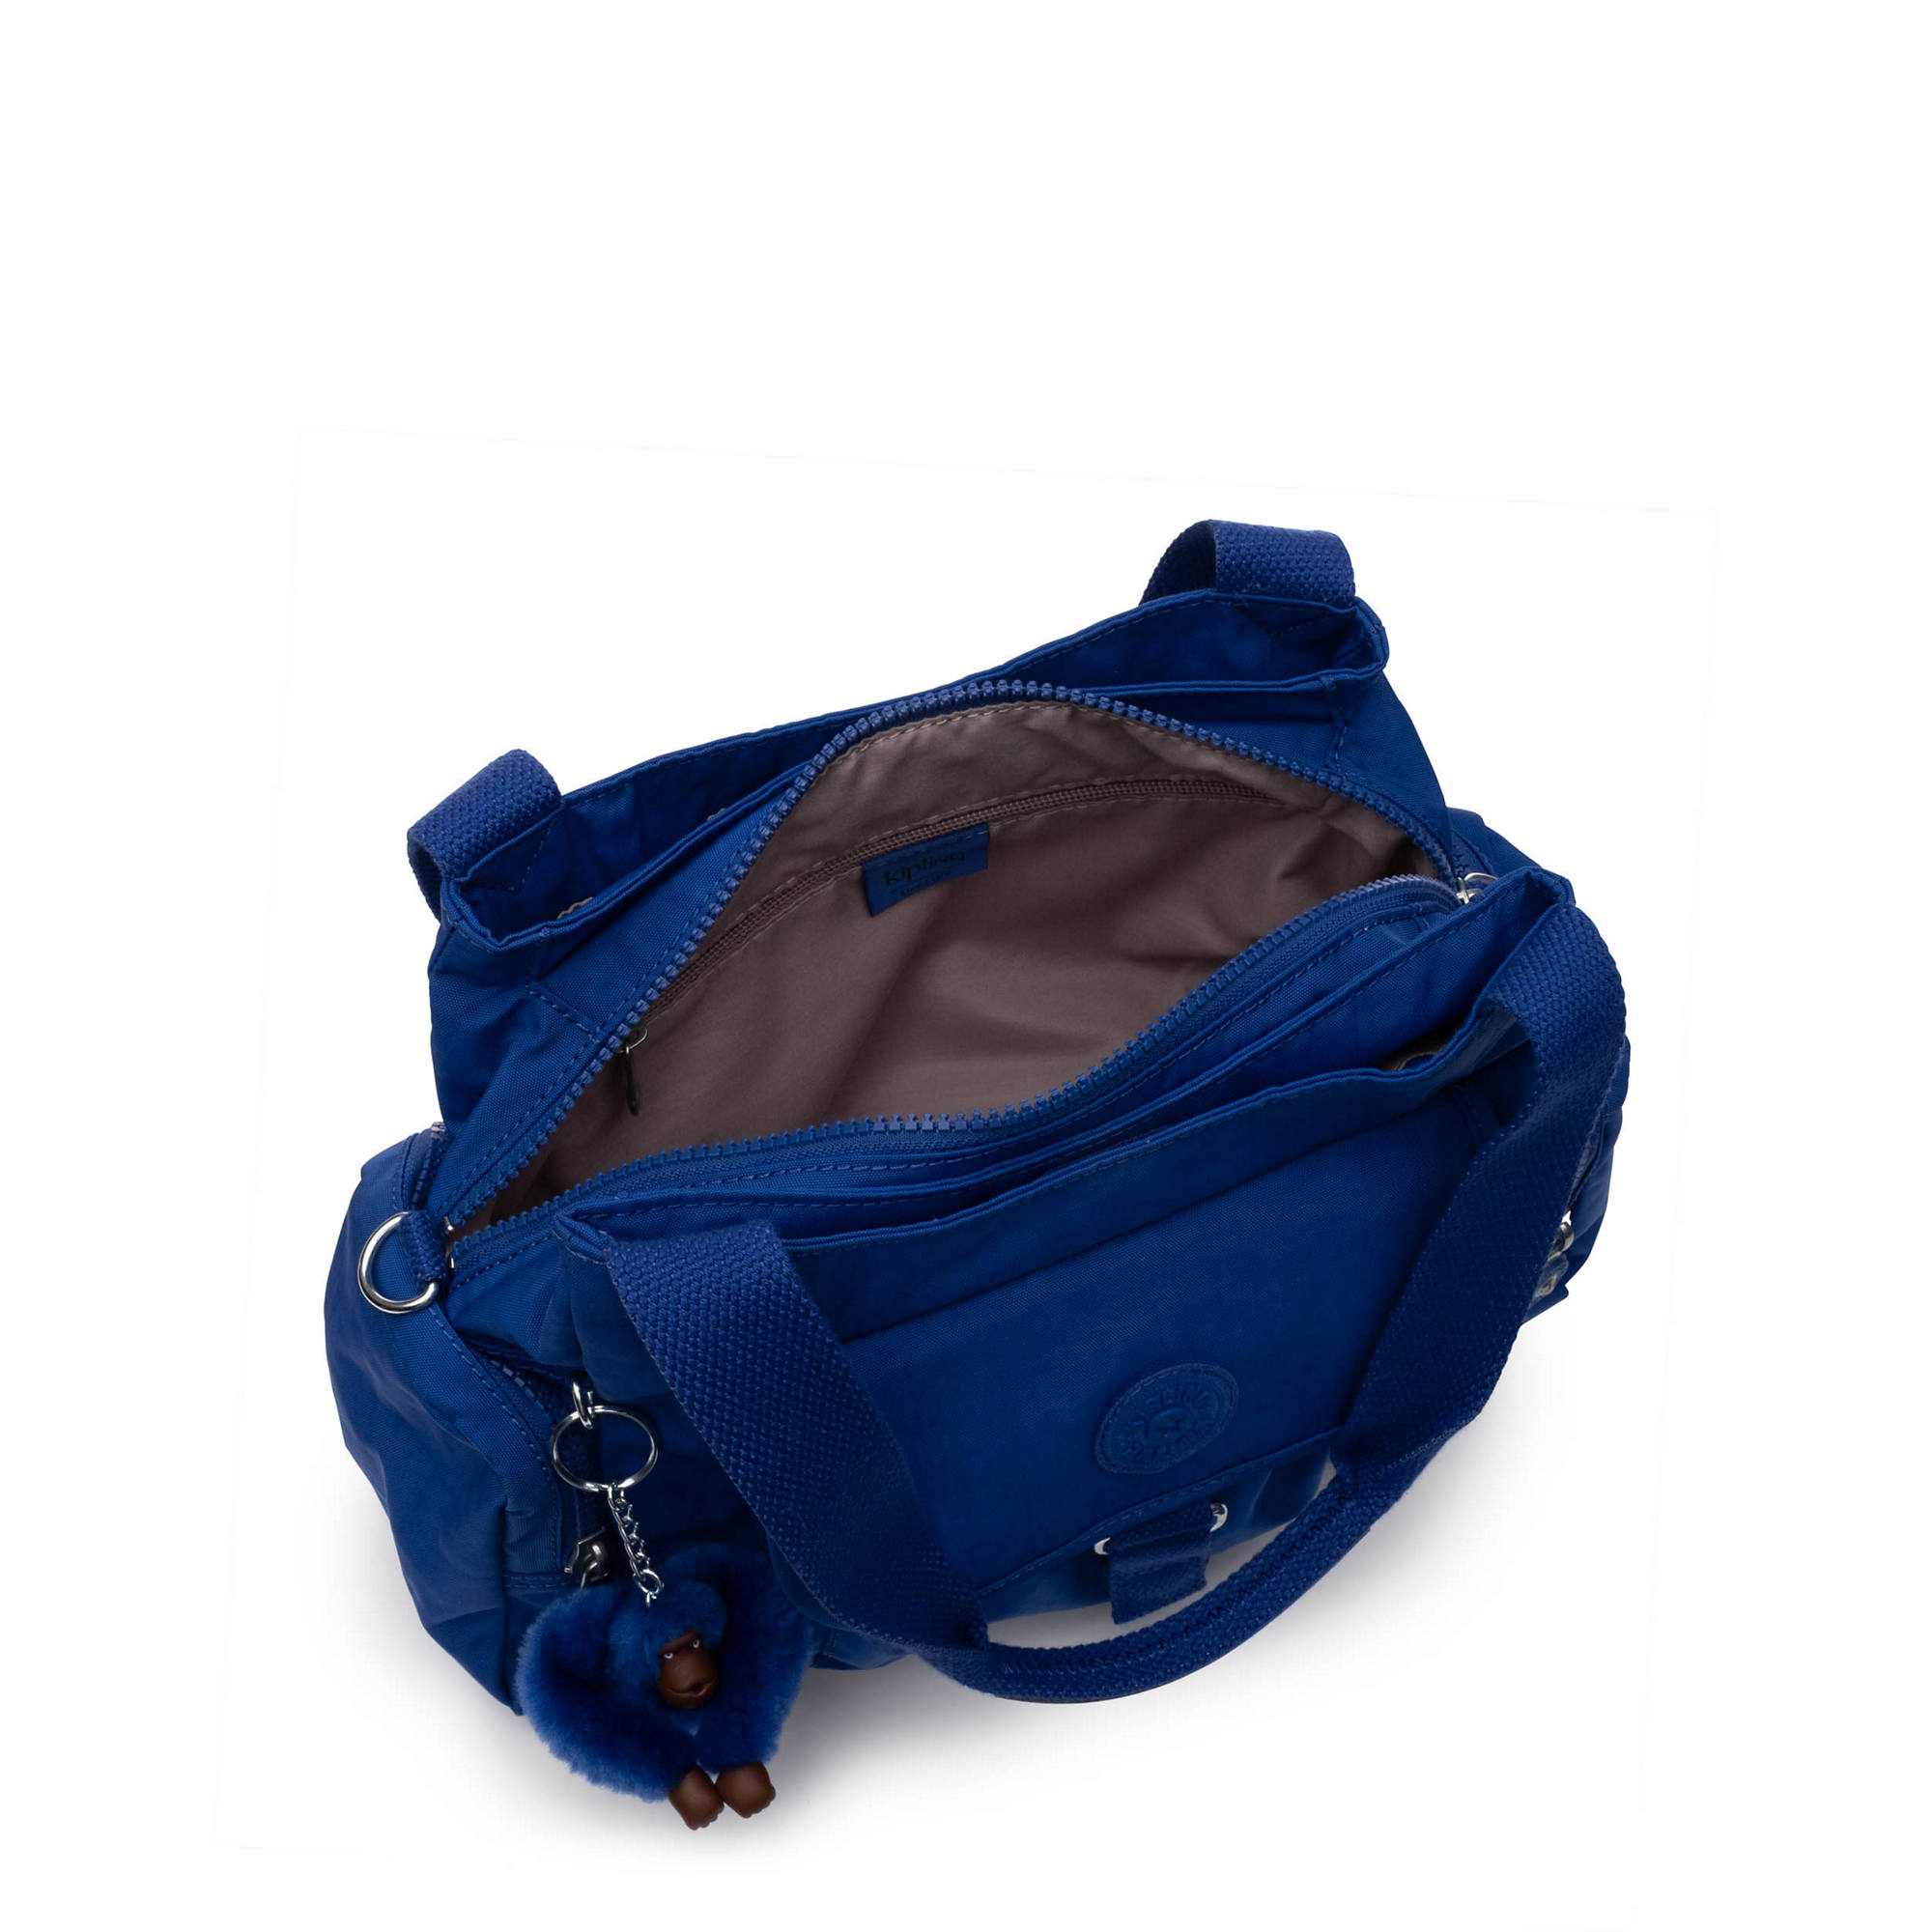 Kipling-Felix-Large-Handbag miniature 15